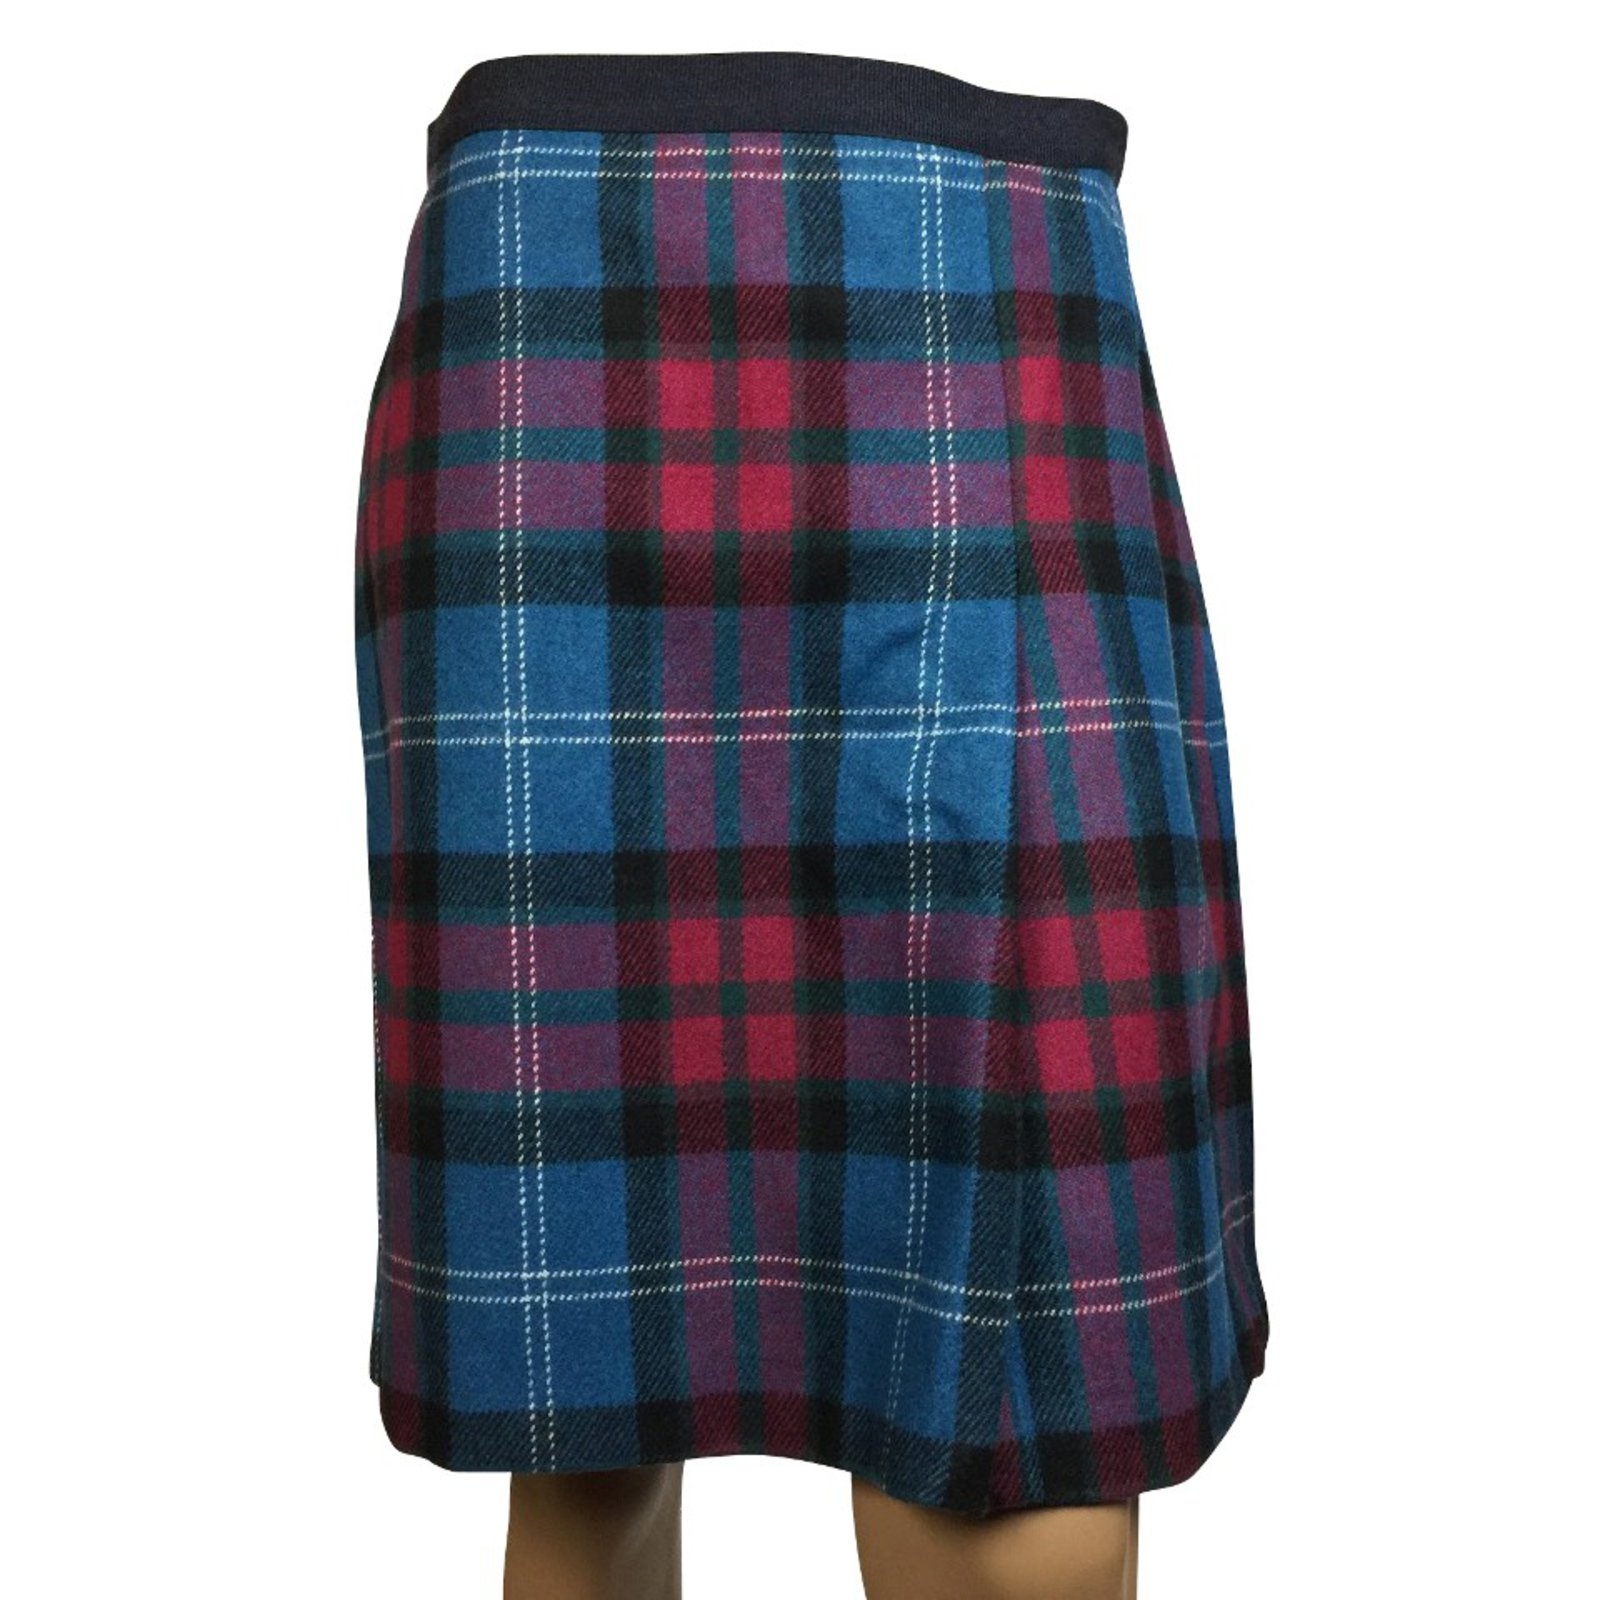 b0d60fdc9 Weekend Max Mara Wrap plaid skirt Skirts Polyester,Wool Black,Blue,Purple  ref